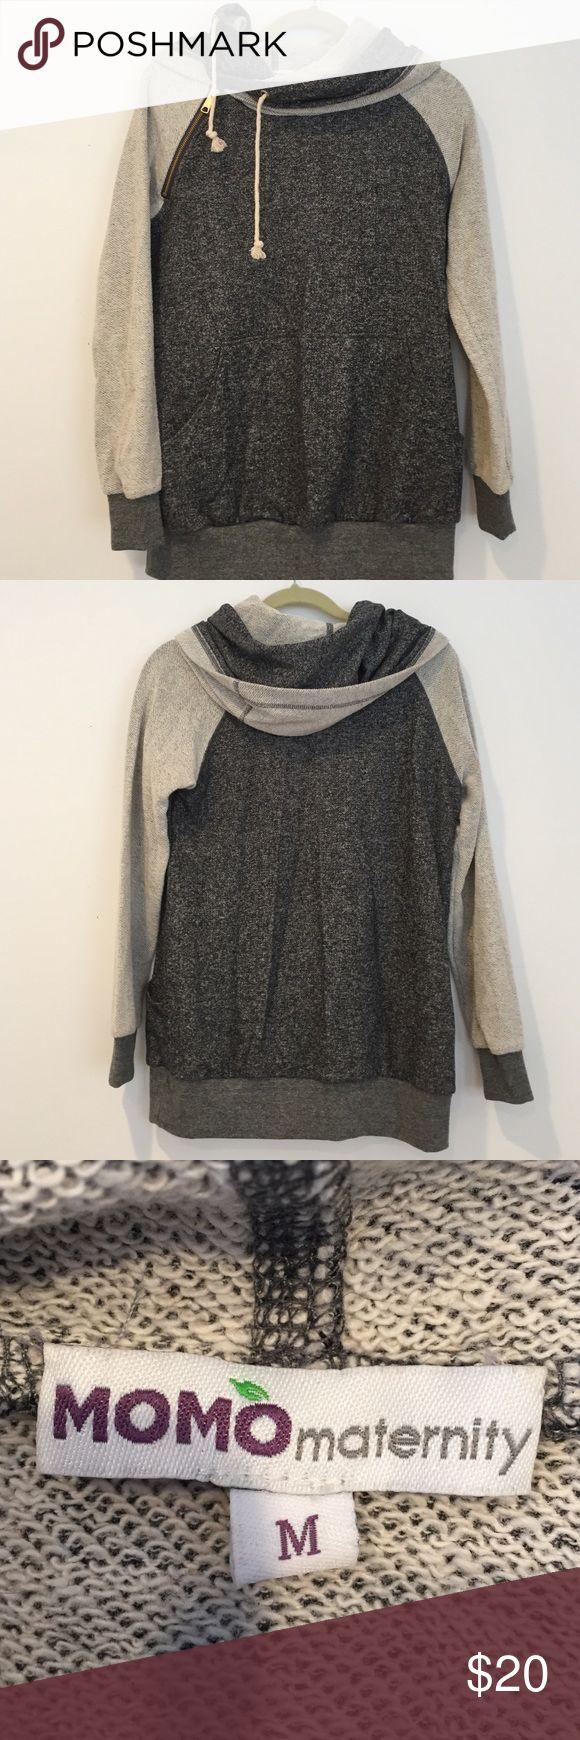 Momo maternity hoodie Worn once, perfect condition, cute hoodie! Momo Maternity Tops Sweatshirts & Hoodies